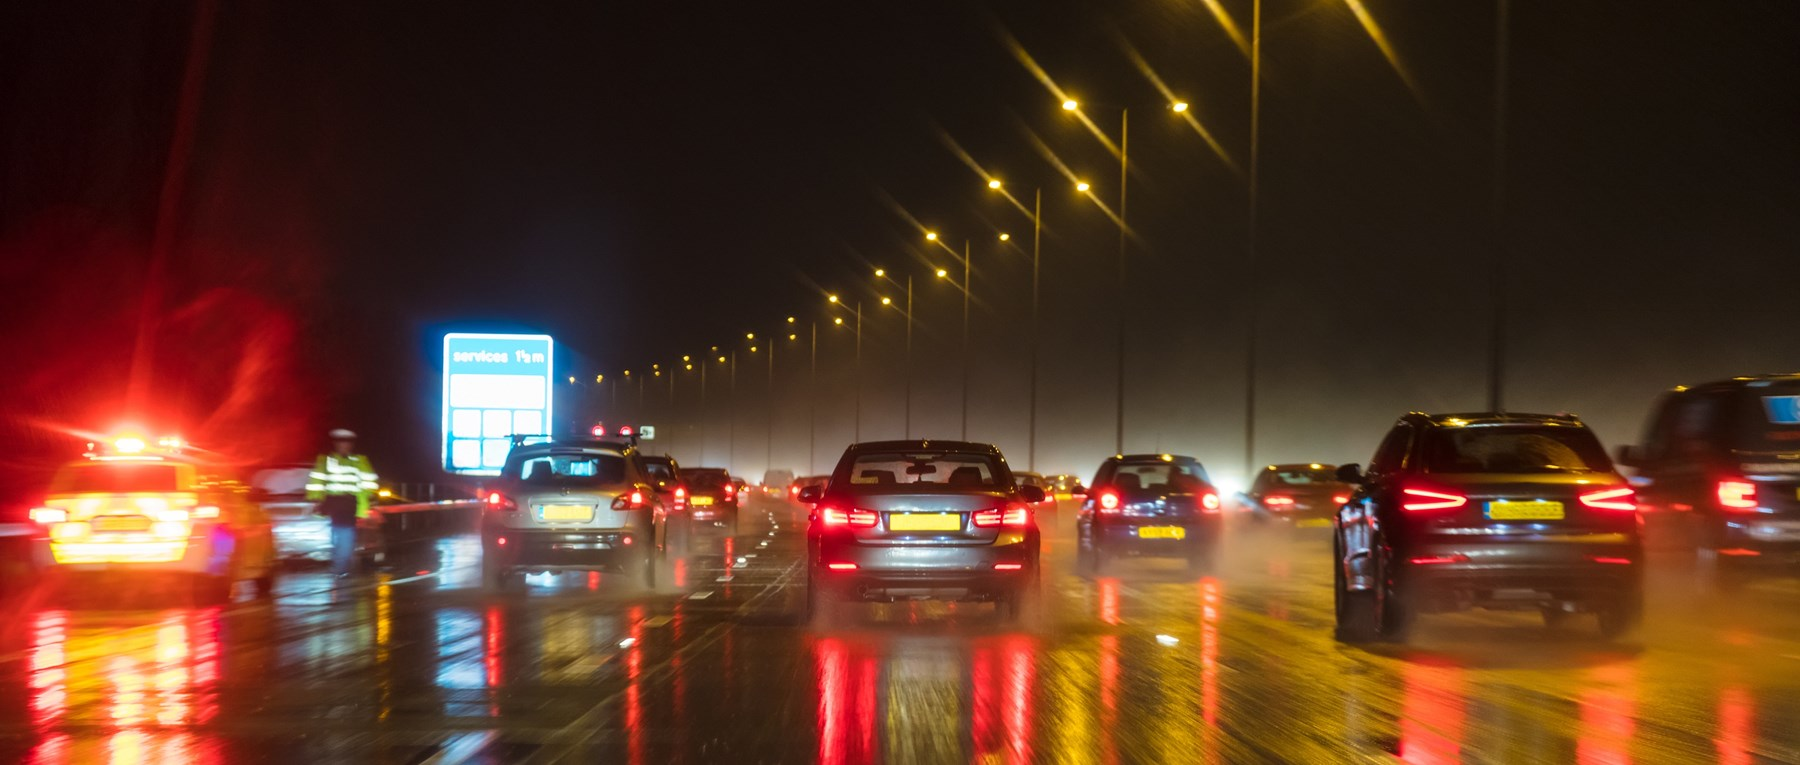 Night traffic on busy road